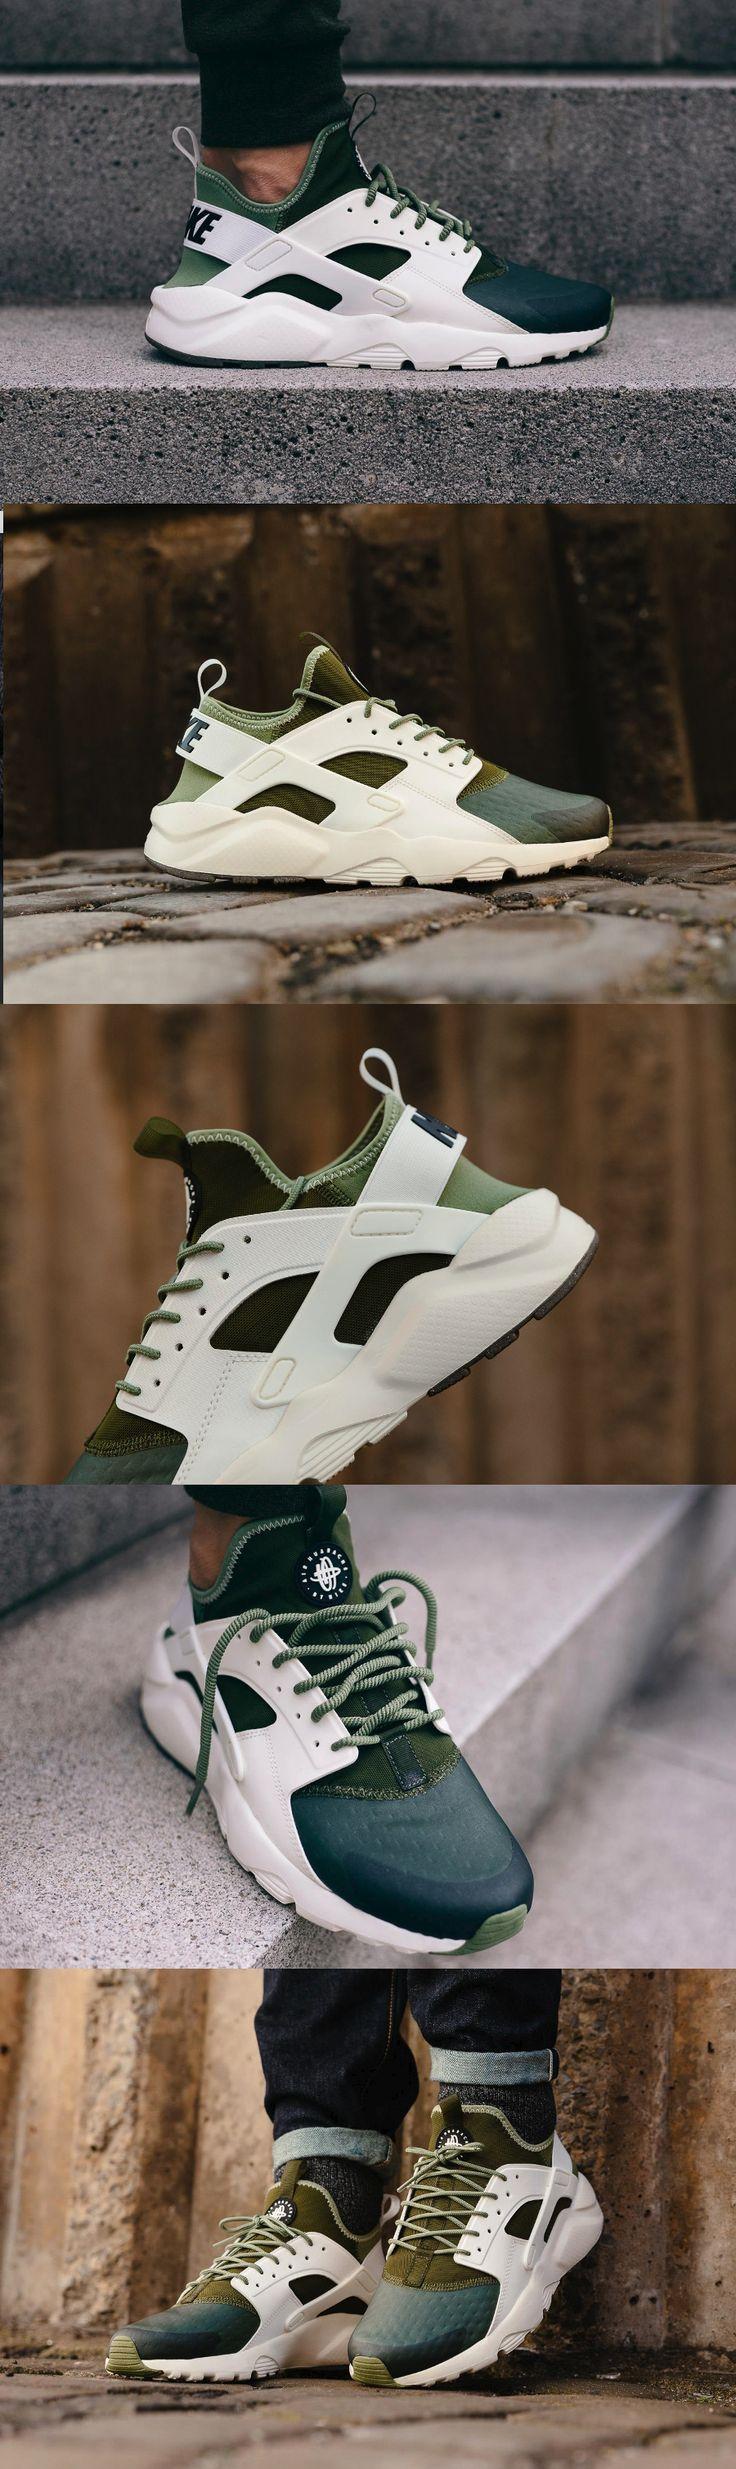 #Nike #Air #Huarache #Ultra #SE #Palm #Green